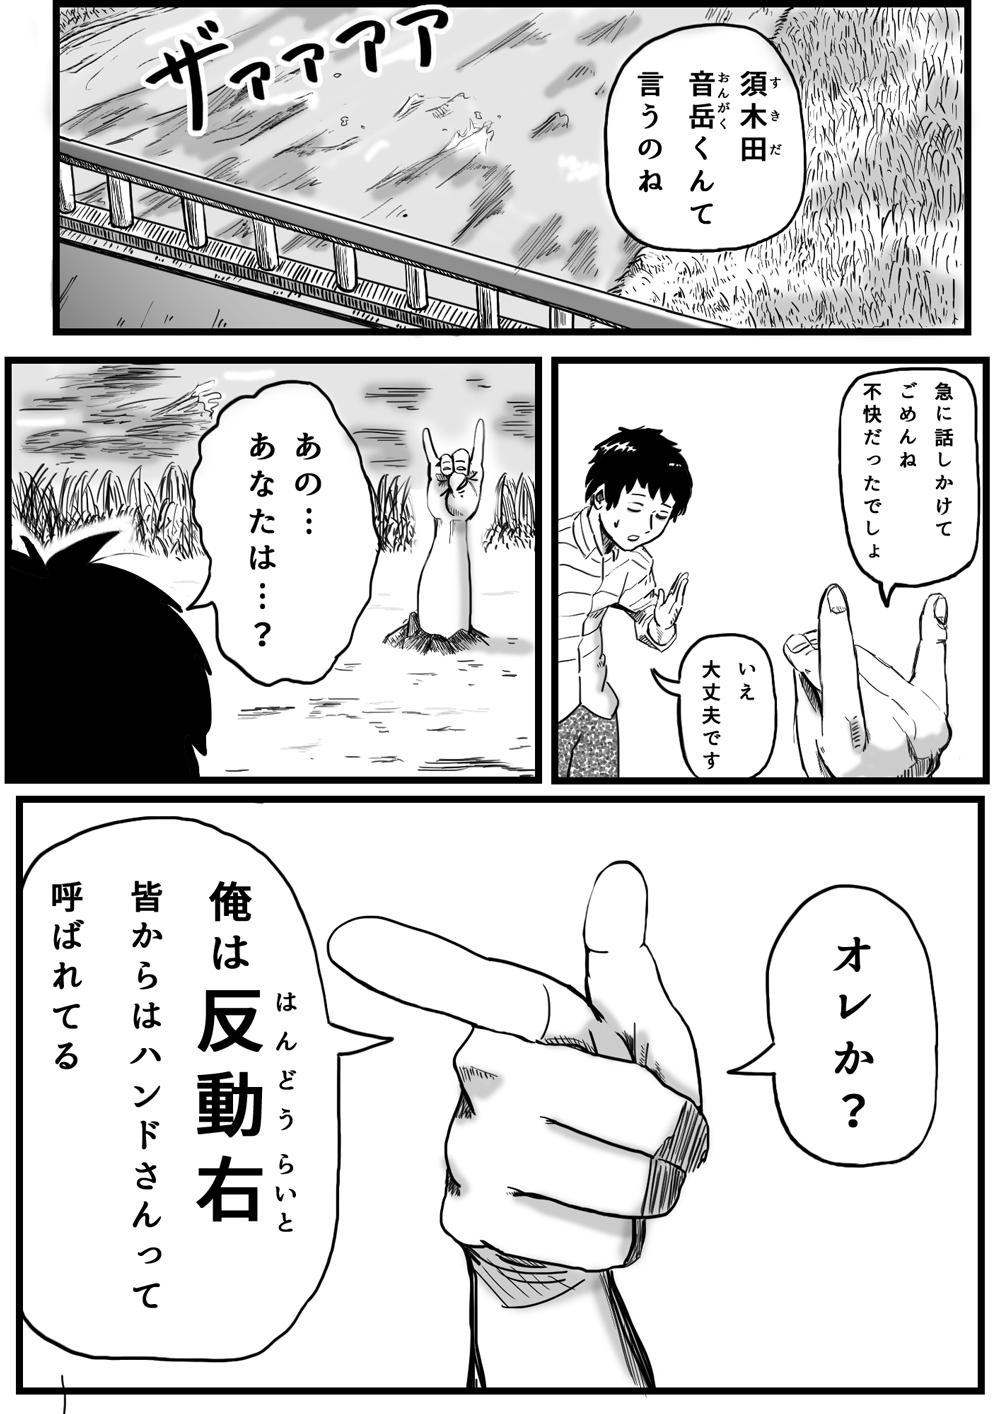 arnolds-hasegawa-002-1